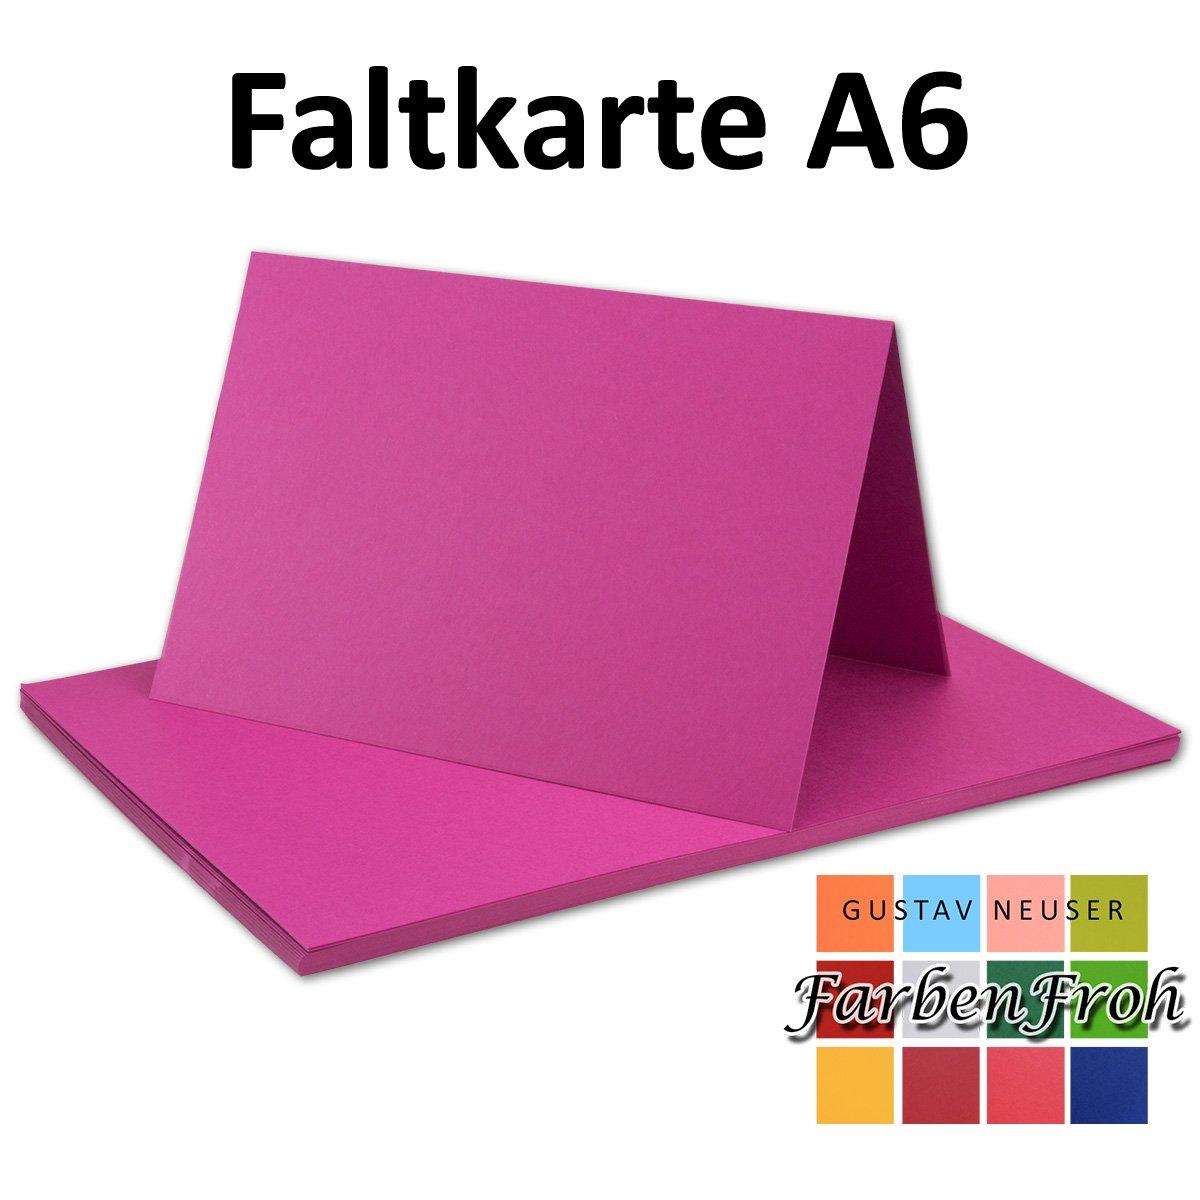 250x Falt-Karten DIN A6 Blanko Doppel-Karten Doppel-Karten Doppel-Karten in Hochweiß Kristallweiß -10,5 x 14,8 cm   Premium Qualität   FarbenFroh® B079T74TN7 | Lebhaft  3bd554